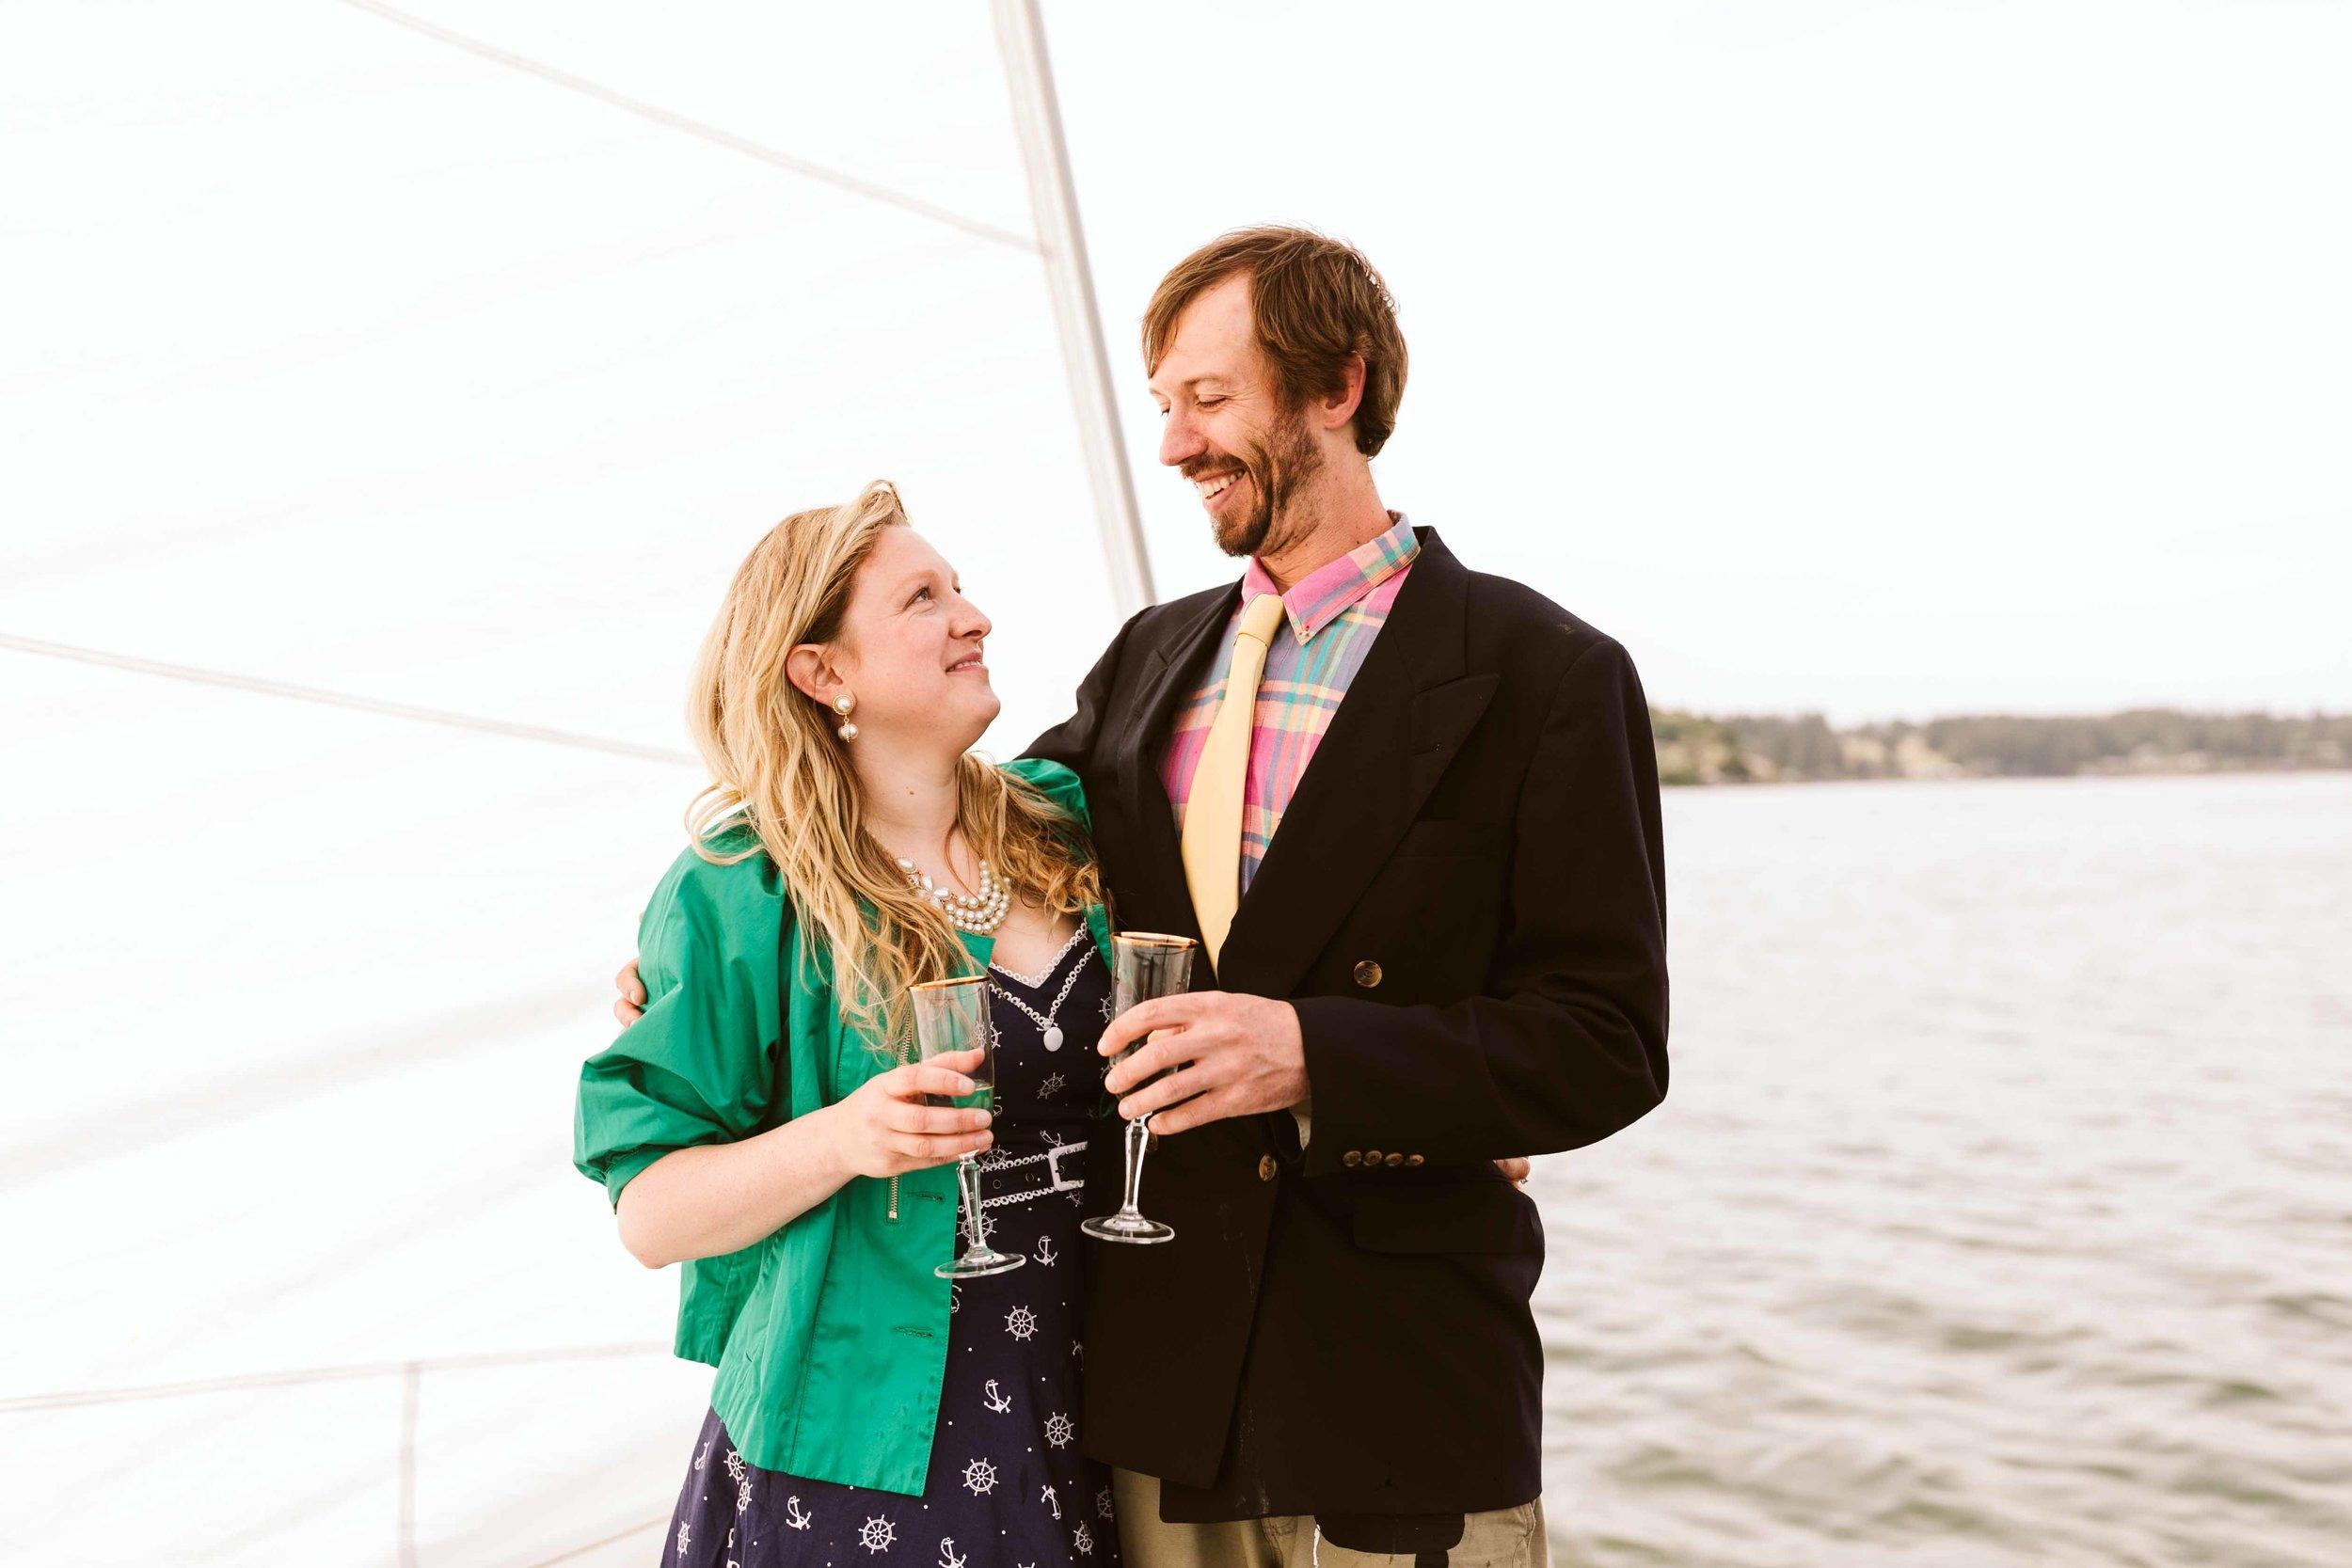 sailboat-engagement-photos-4.jpg